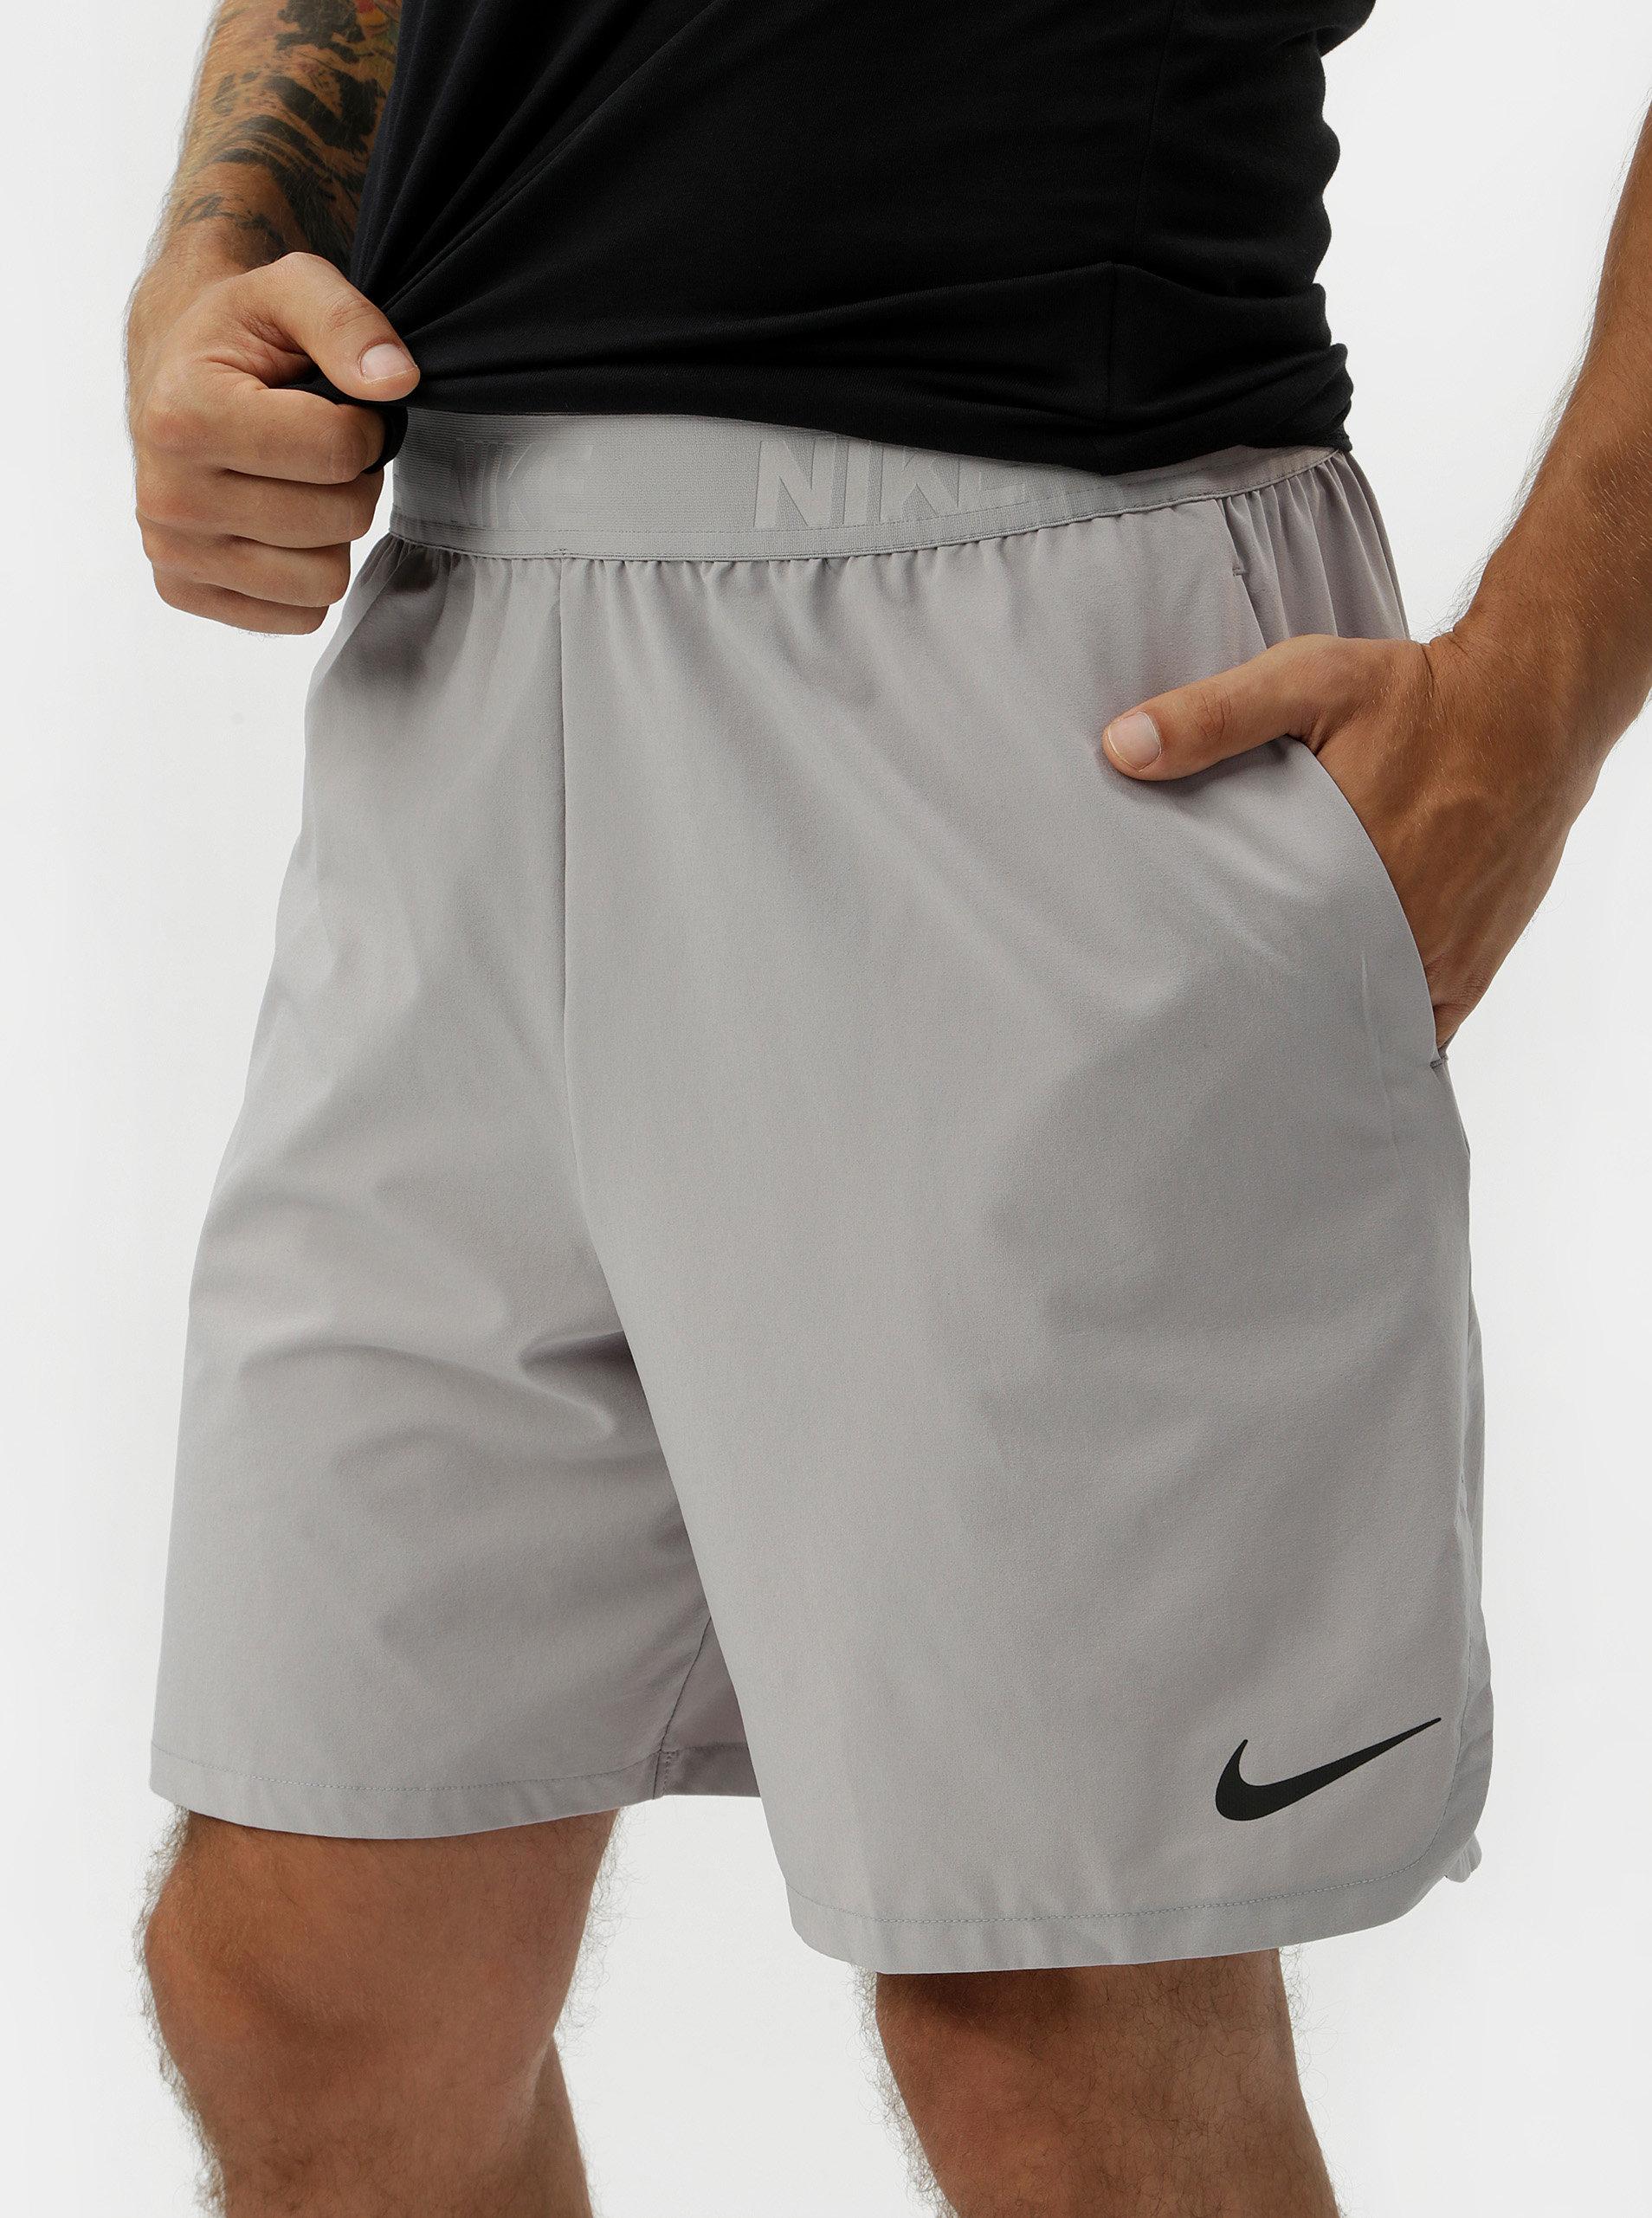 Šedé pánské standart fit kraťasy Nike Vent Max 2.0 ... 5aa55ab7bd